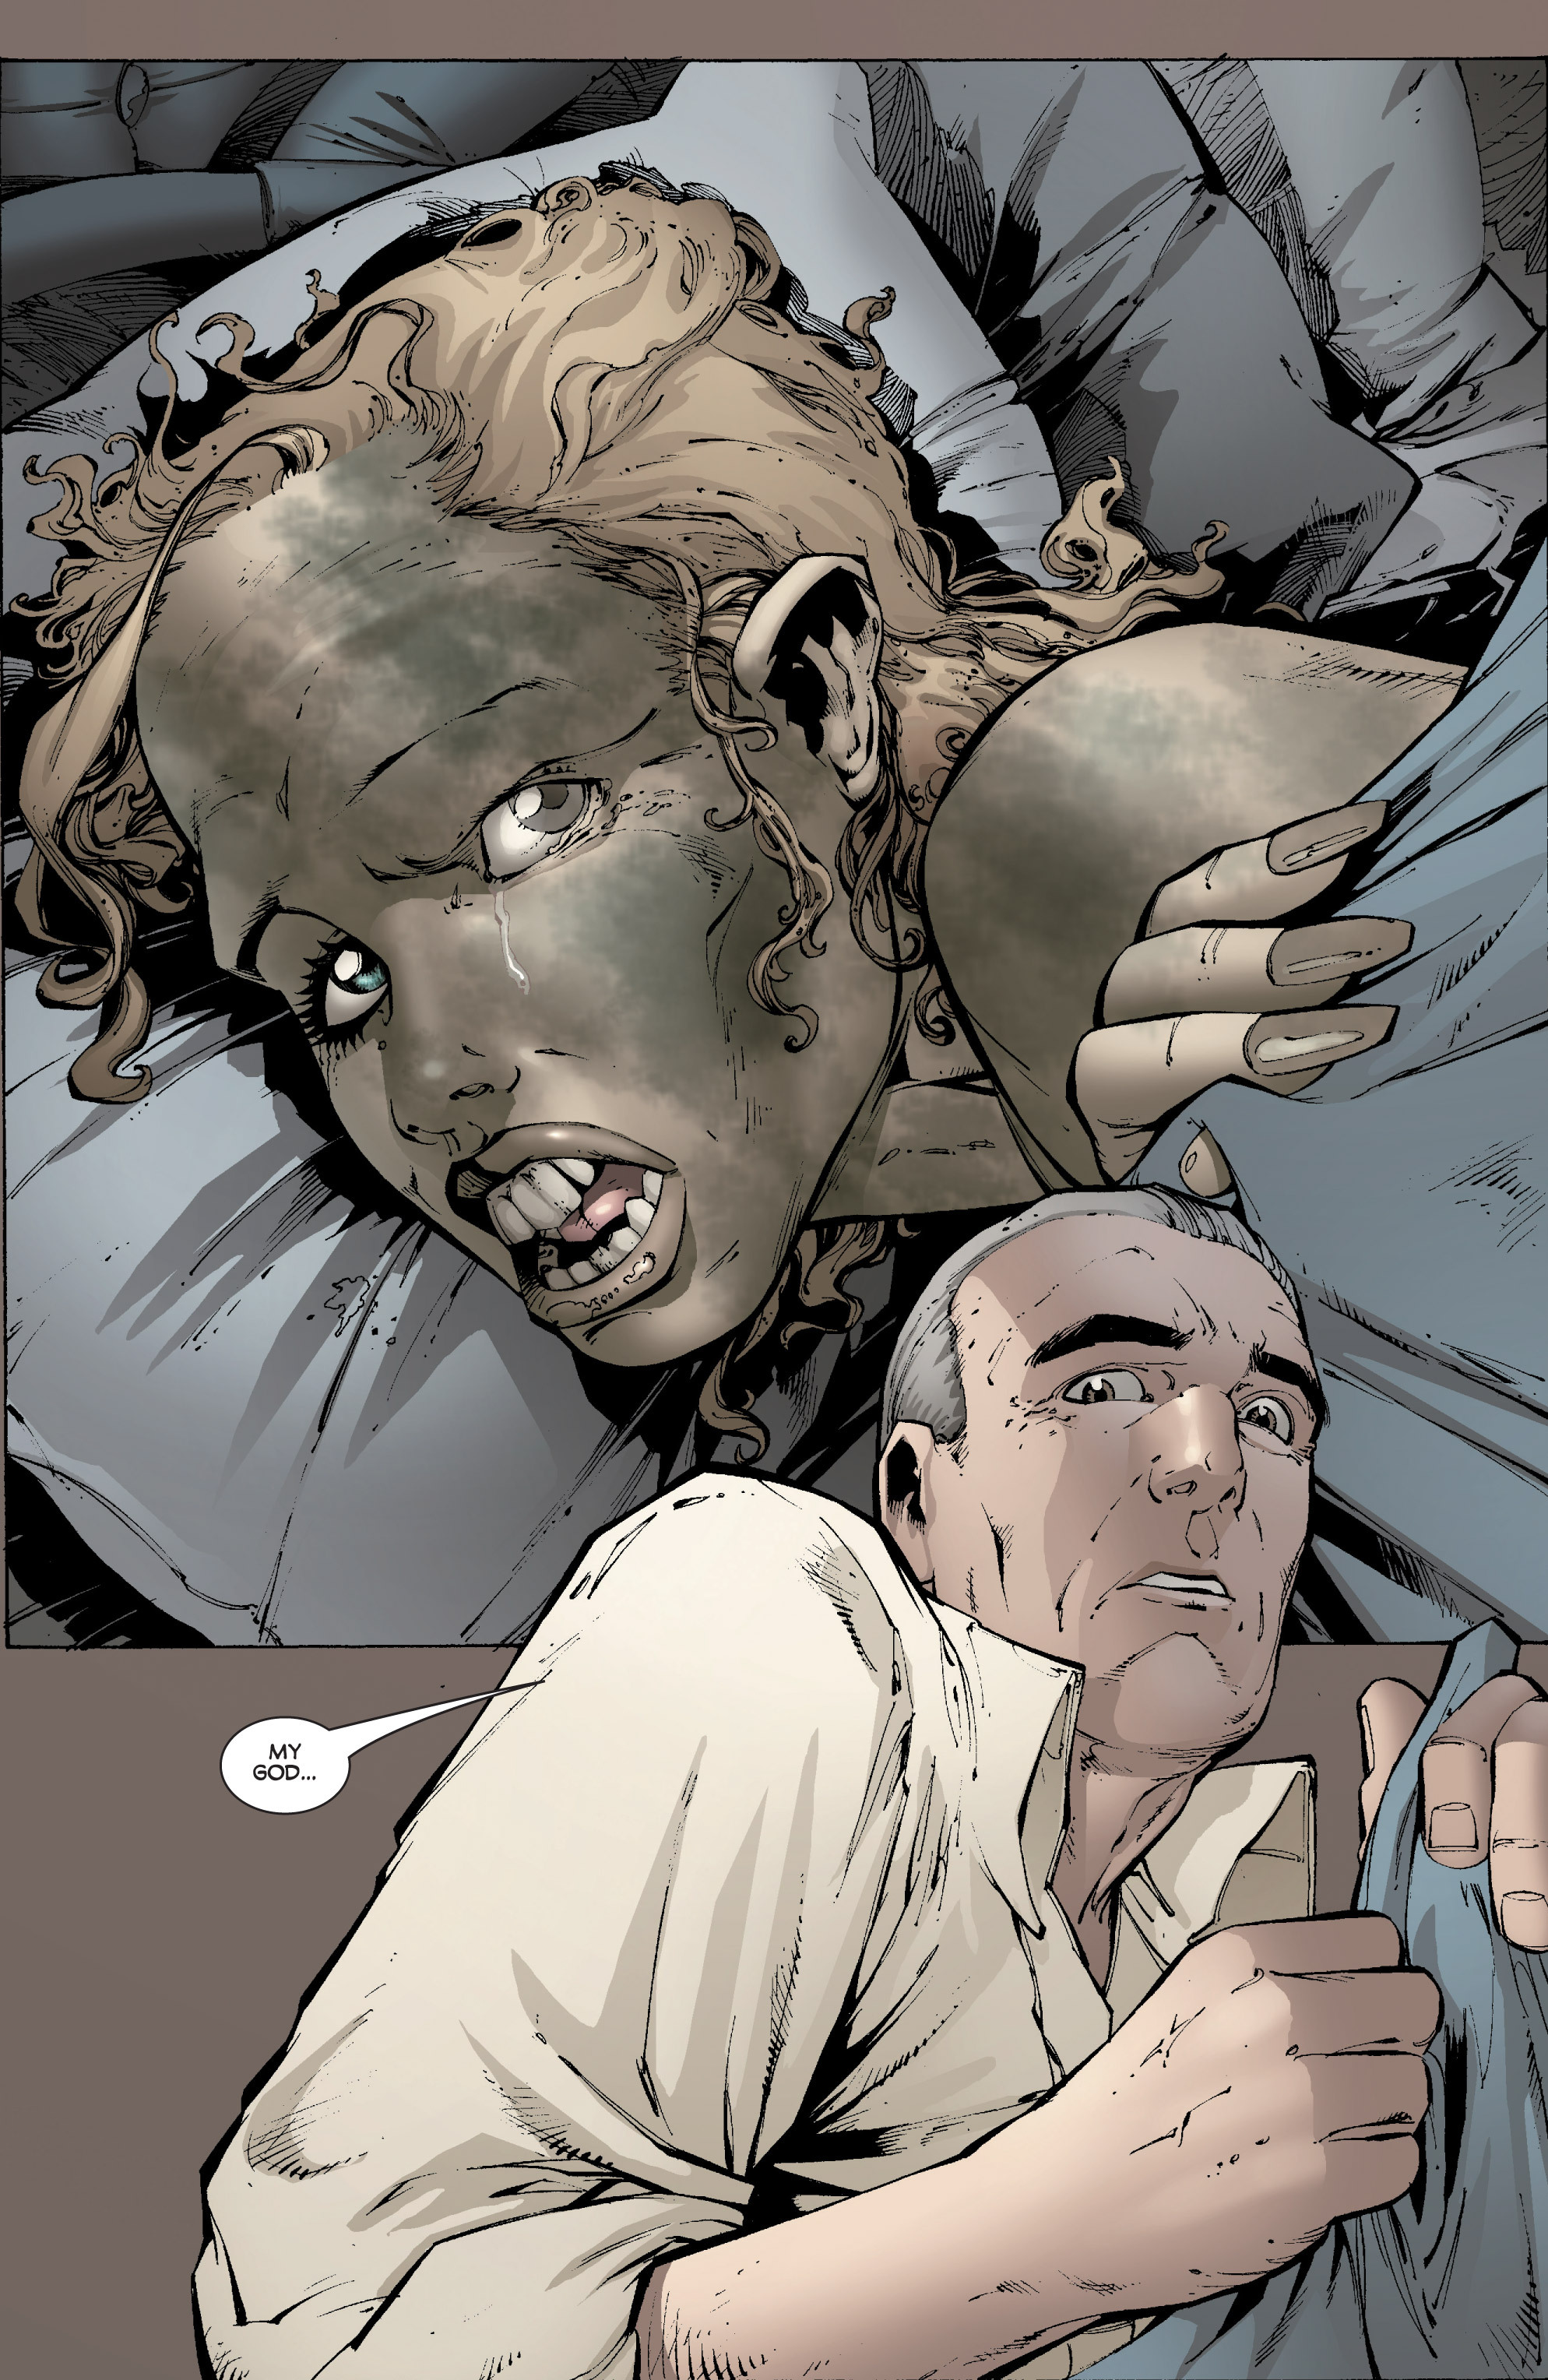 Read online World War Hulk: Gamma Corps comic -  Issue #3 - 16